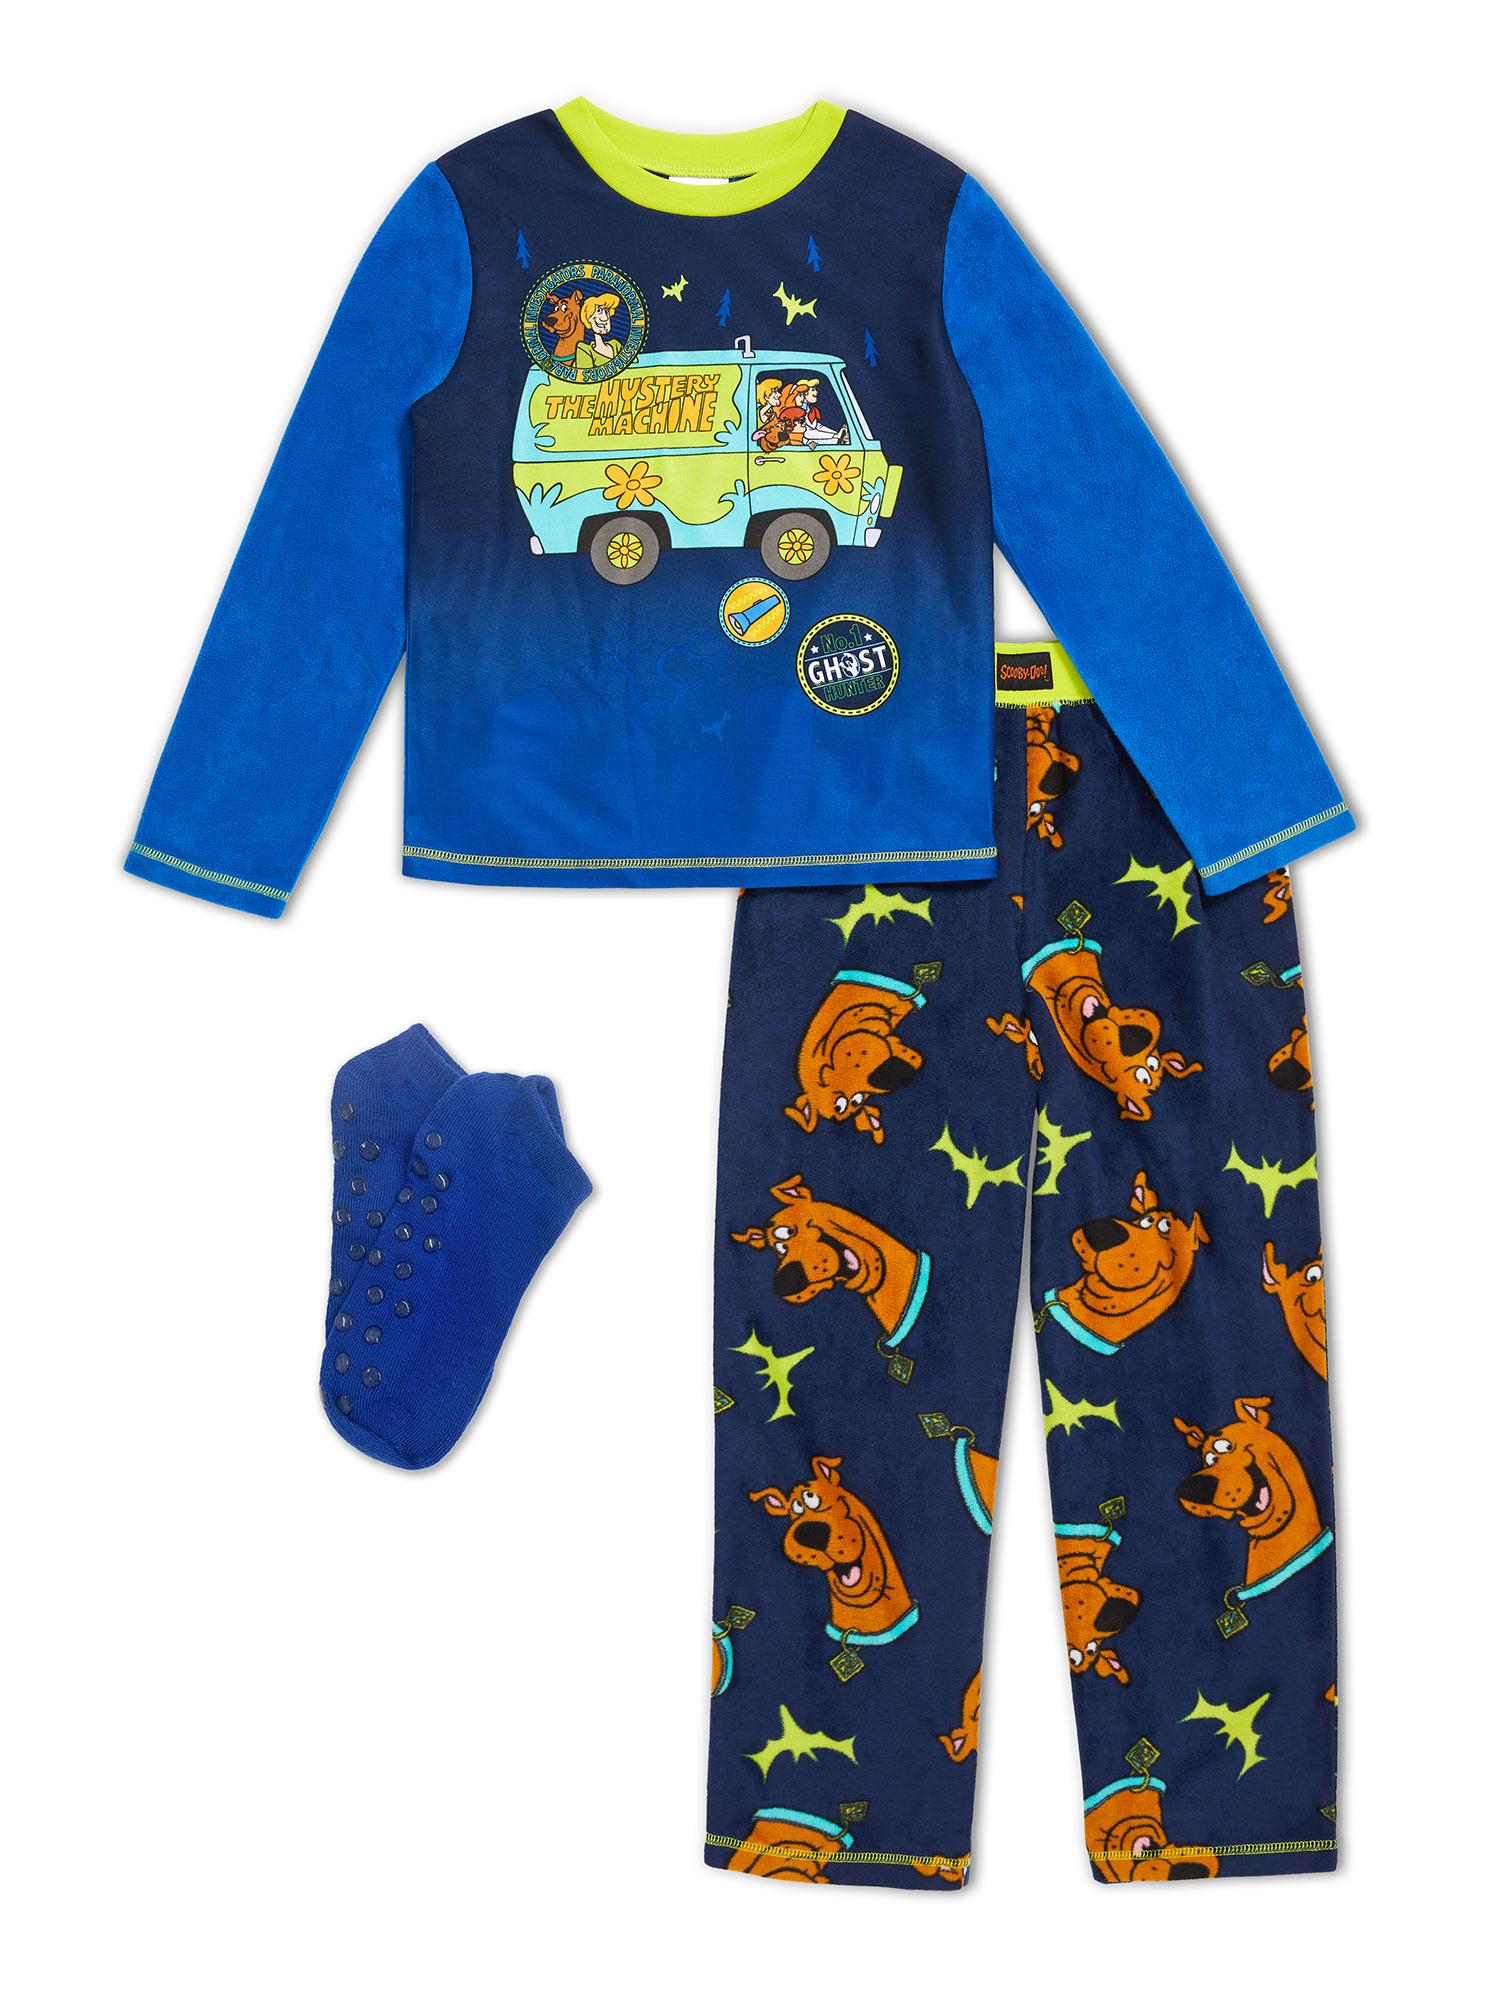 2T Scooby Doo Little Boys Blue Striped Pajamas